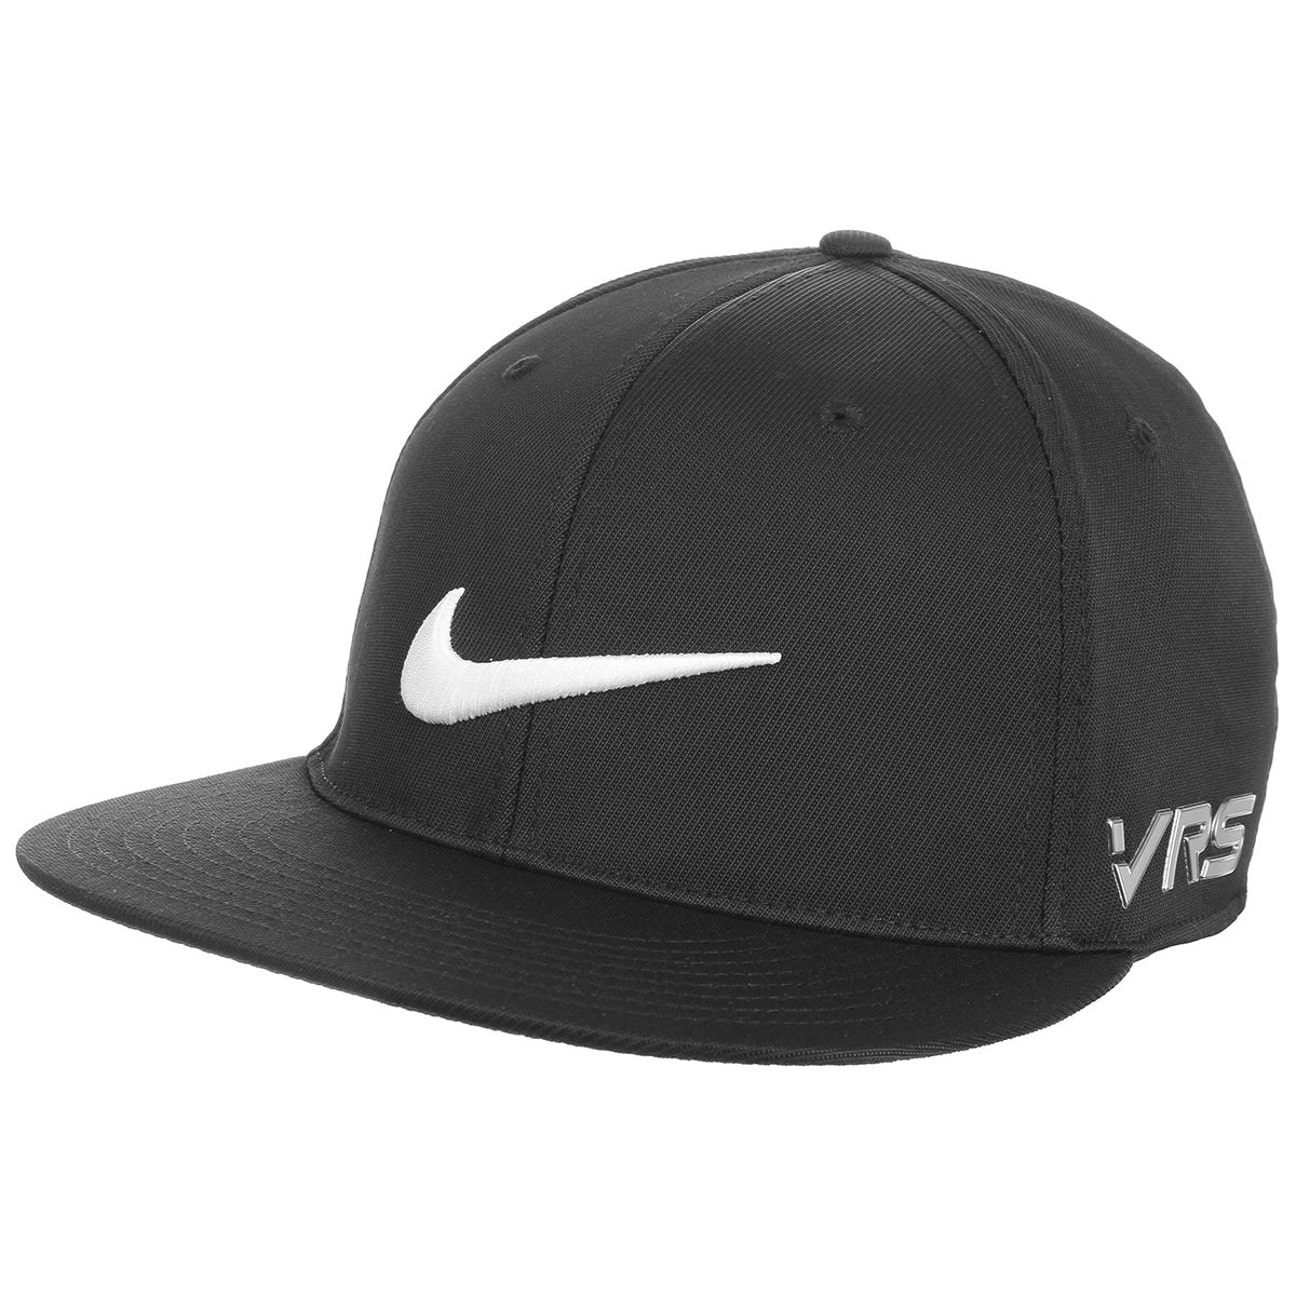 Gorra Plana Bill Tour by Nike - Gorras - sombreroshop.es c1e2df87e99